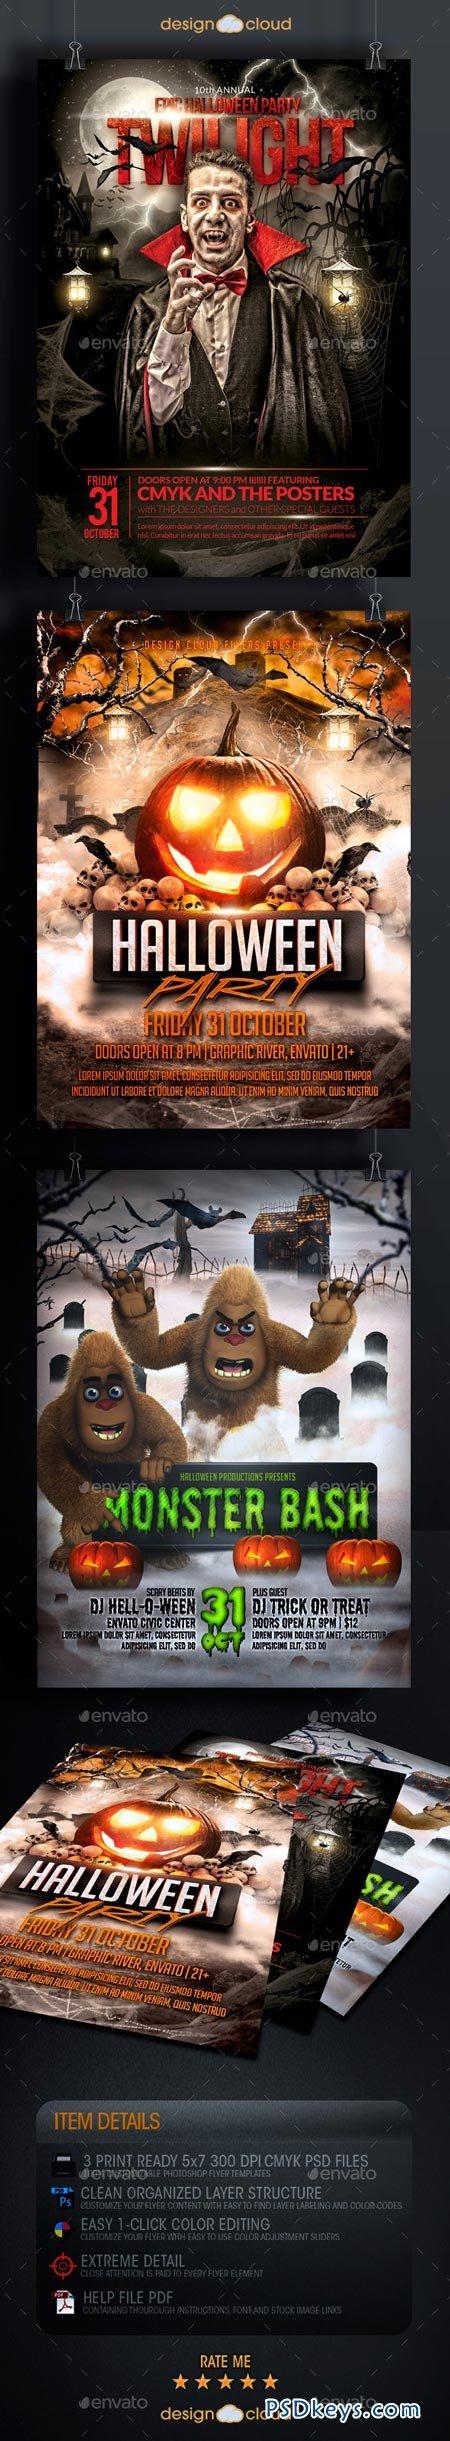 Halloween Flyer Template Bundle 8985005